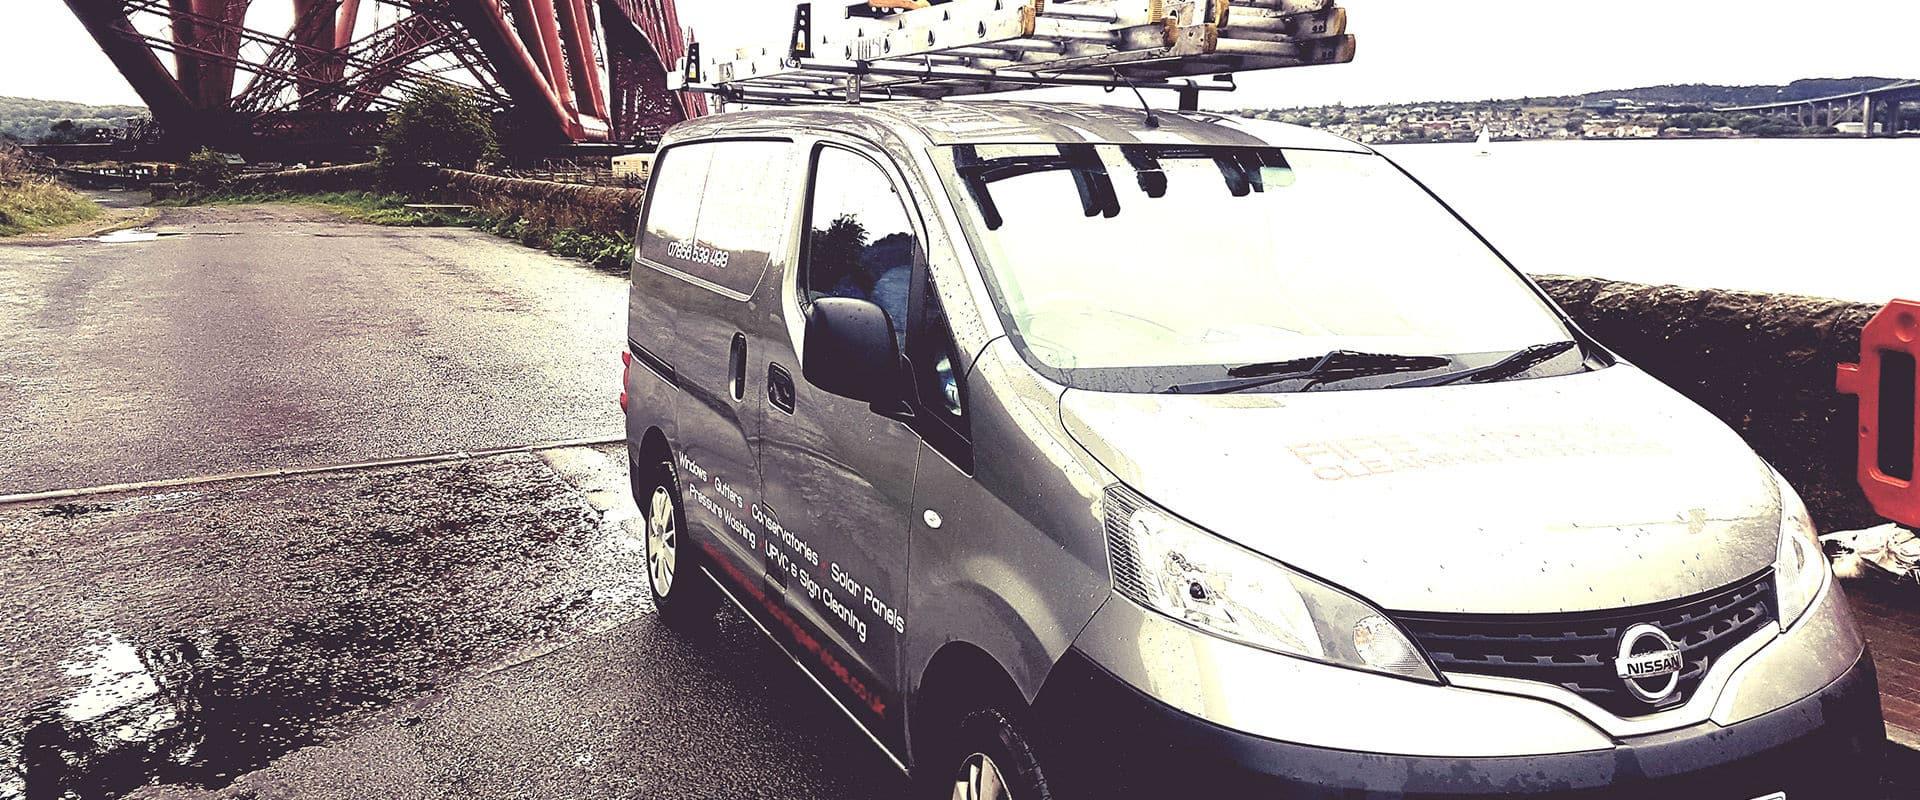 Window Cleaning Dunfermline, Fife